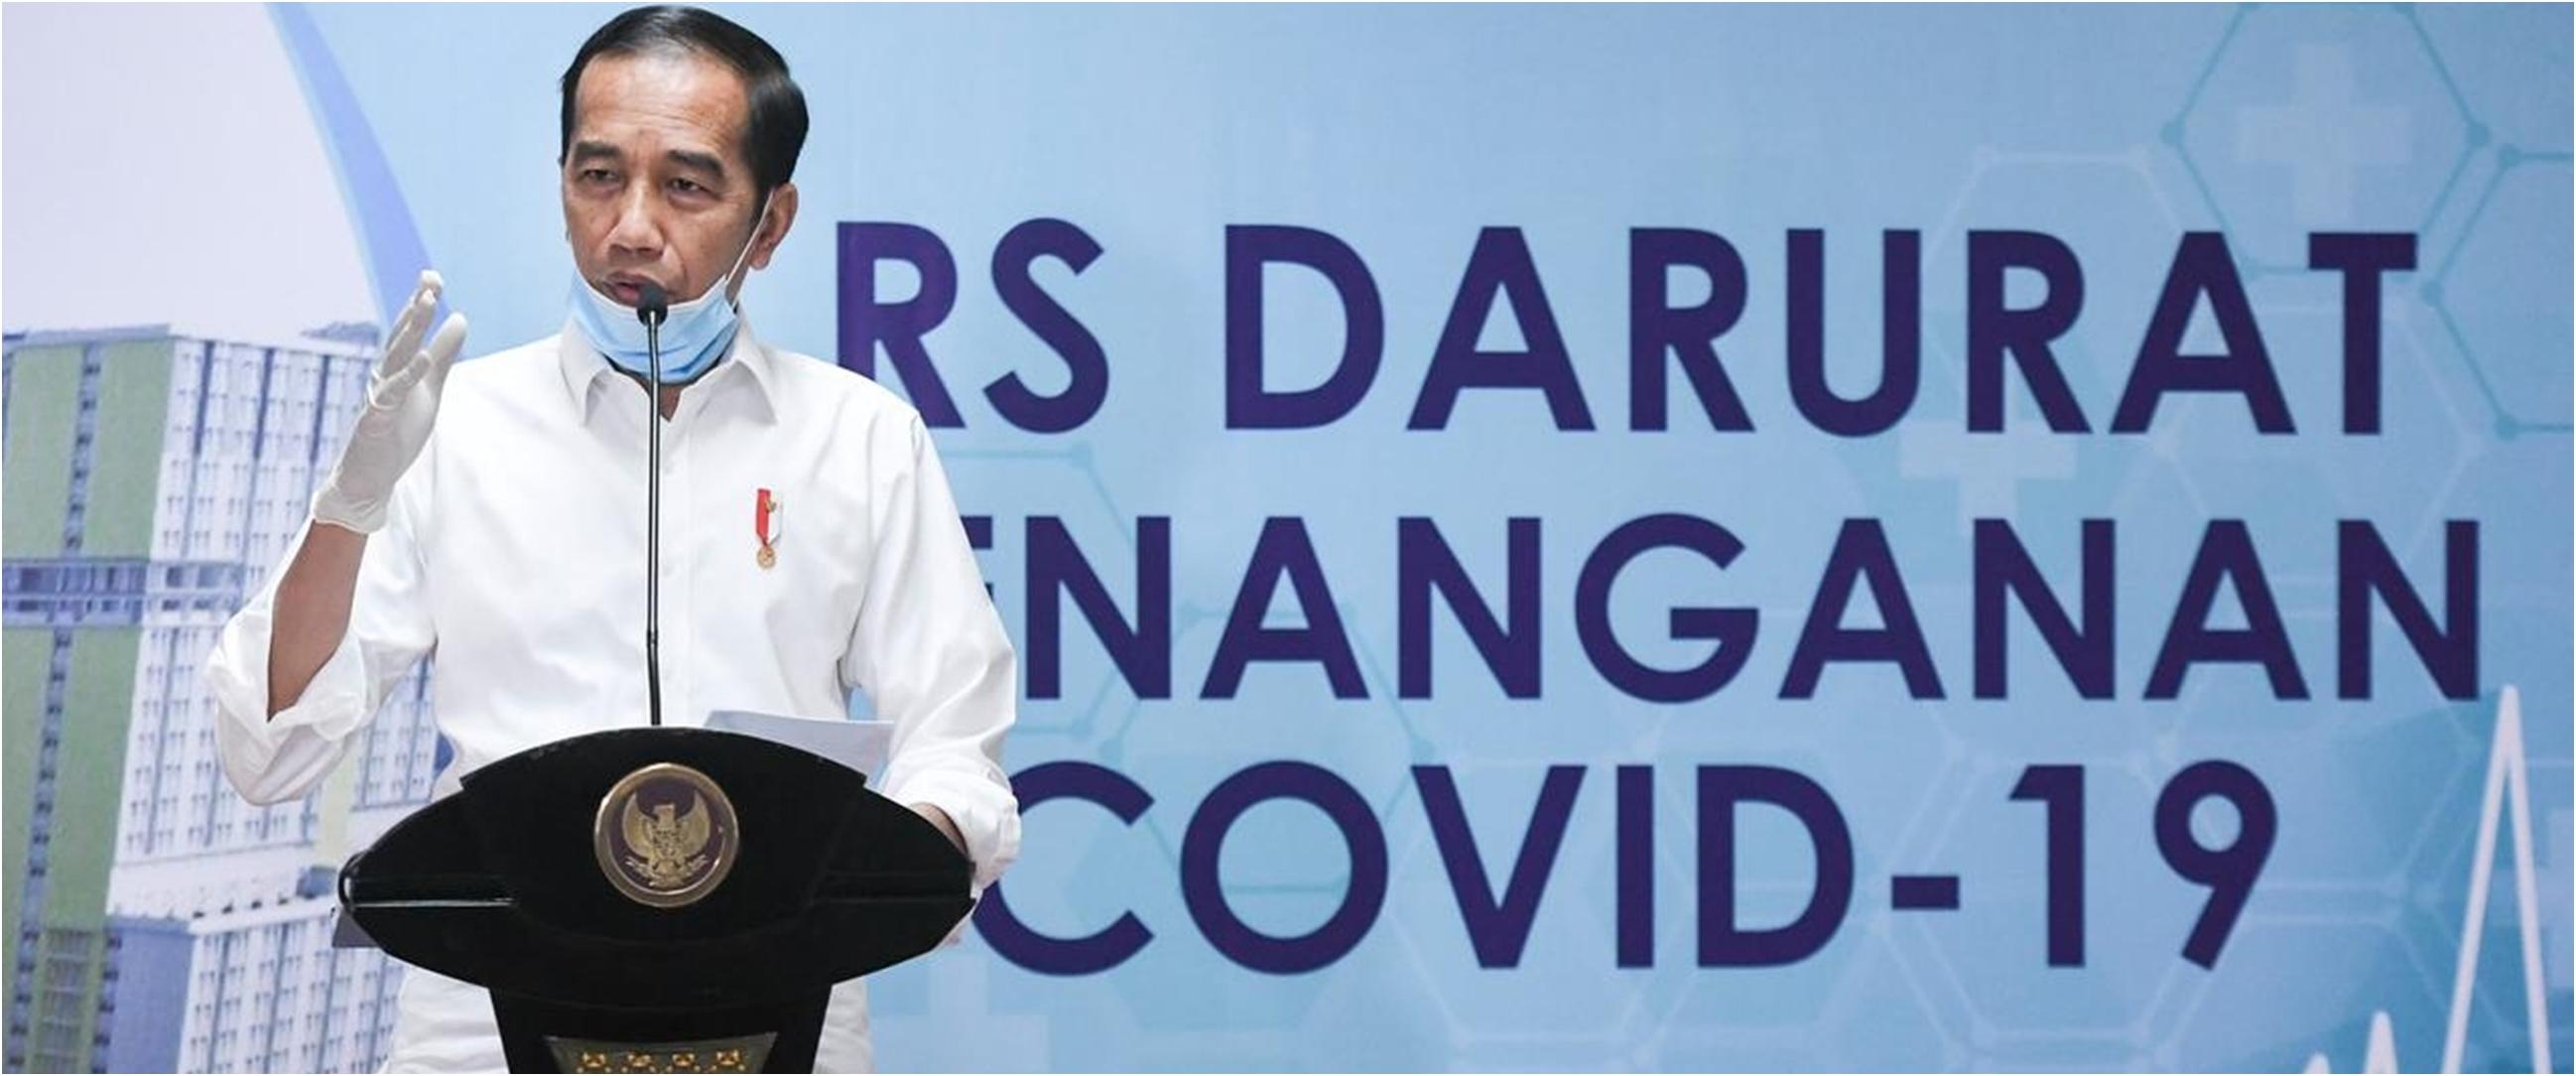 Jokowi resmi larang mudik